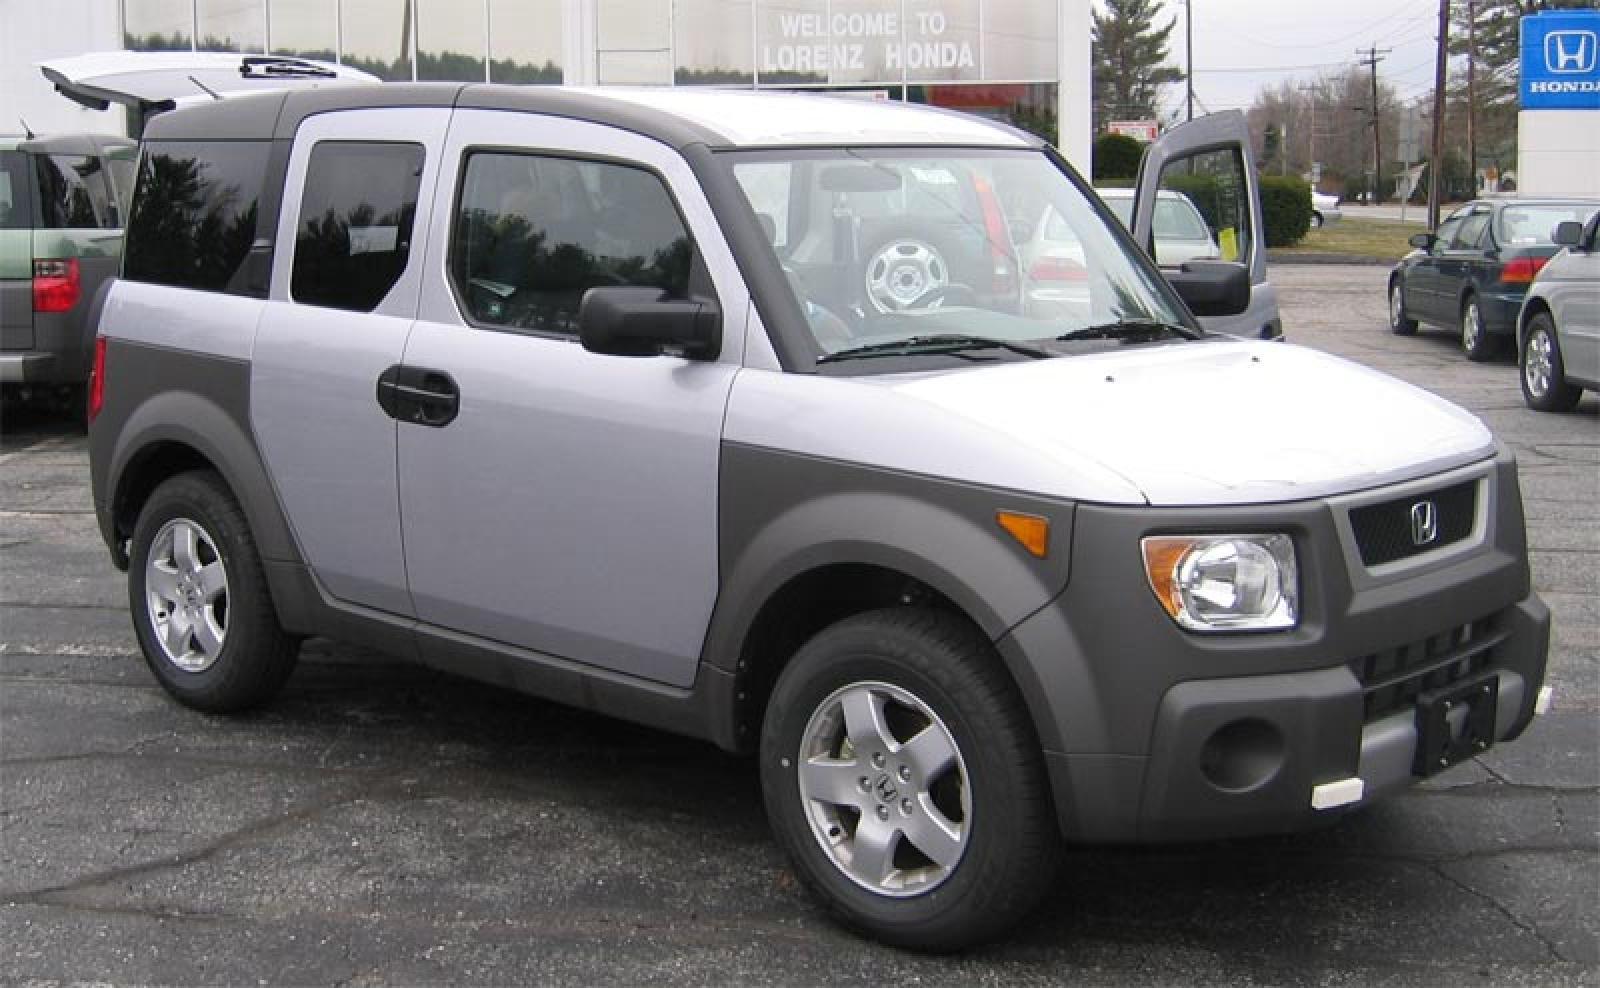 800 1024 1280 1600 origin 2004 Honda Element ...